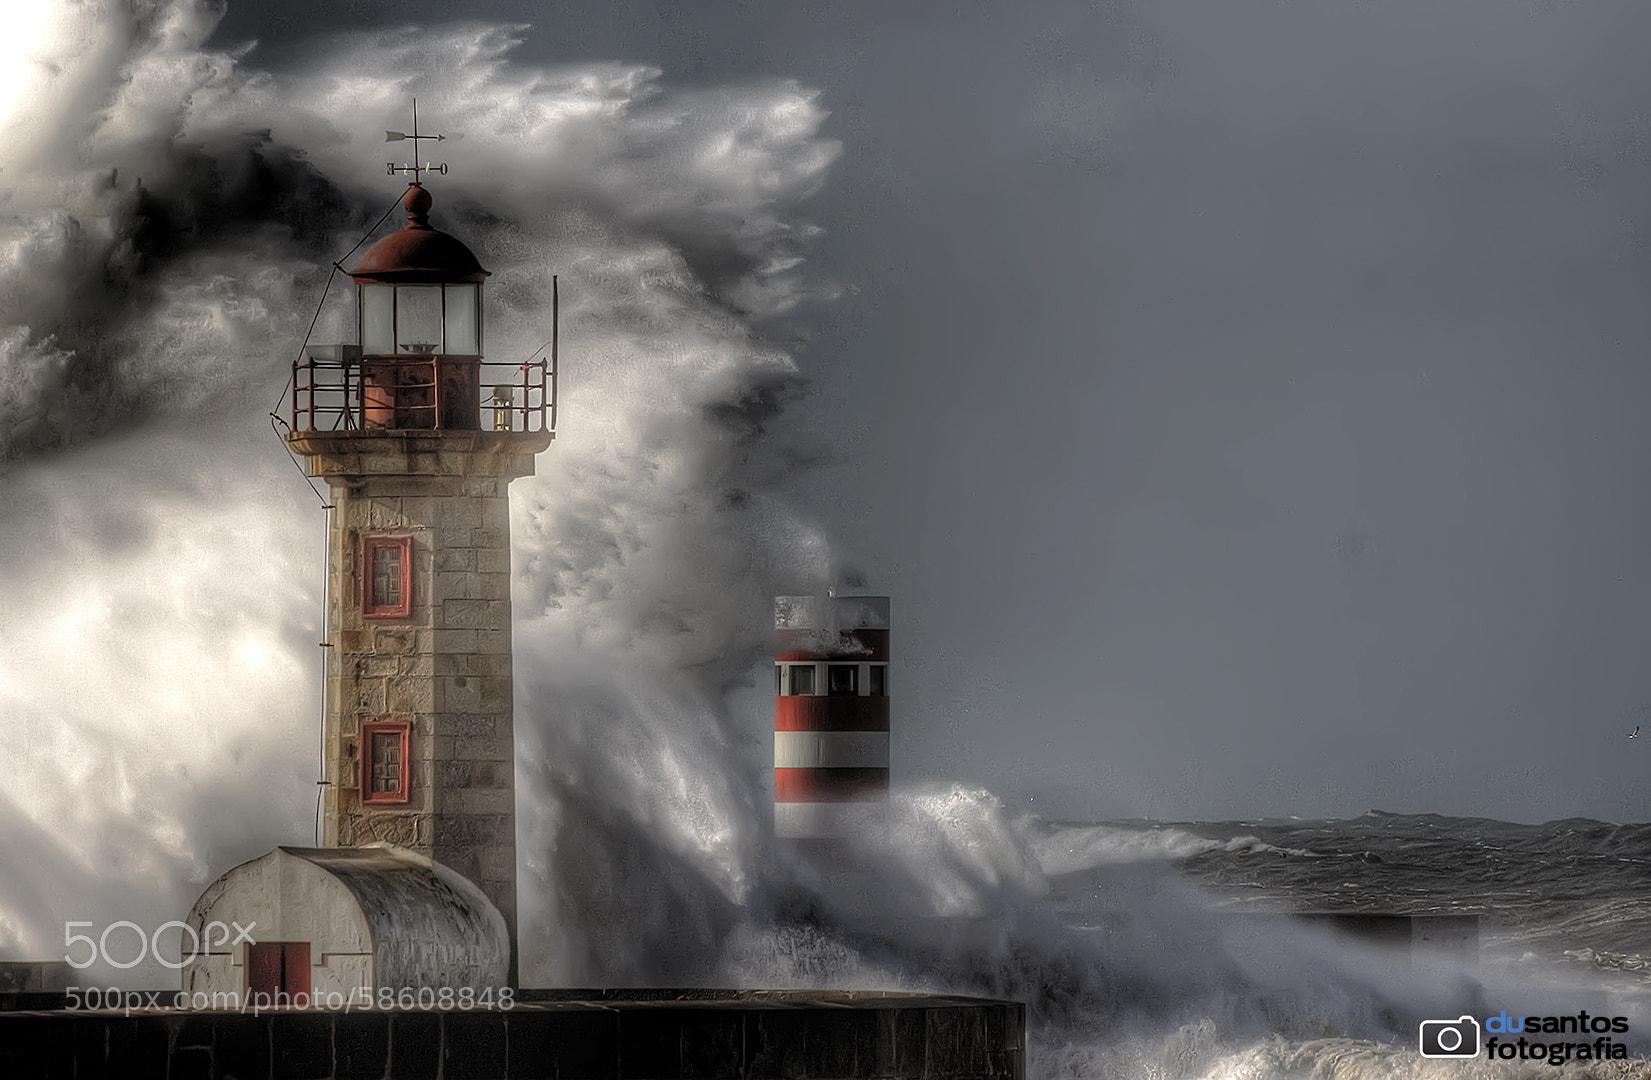 Photograph Red Alert by Duarte Santos on 500px